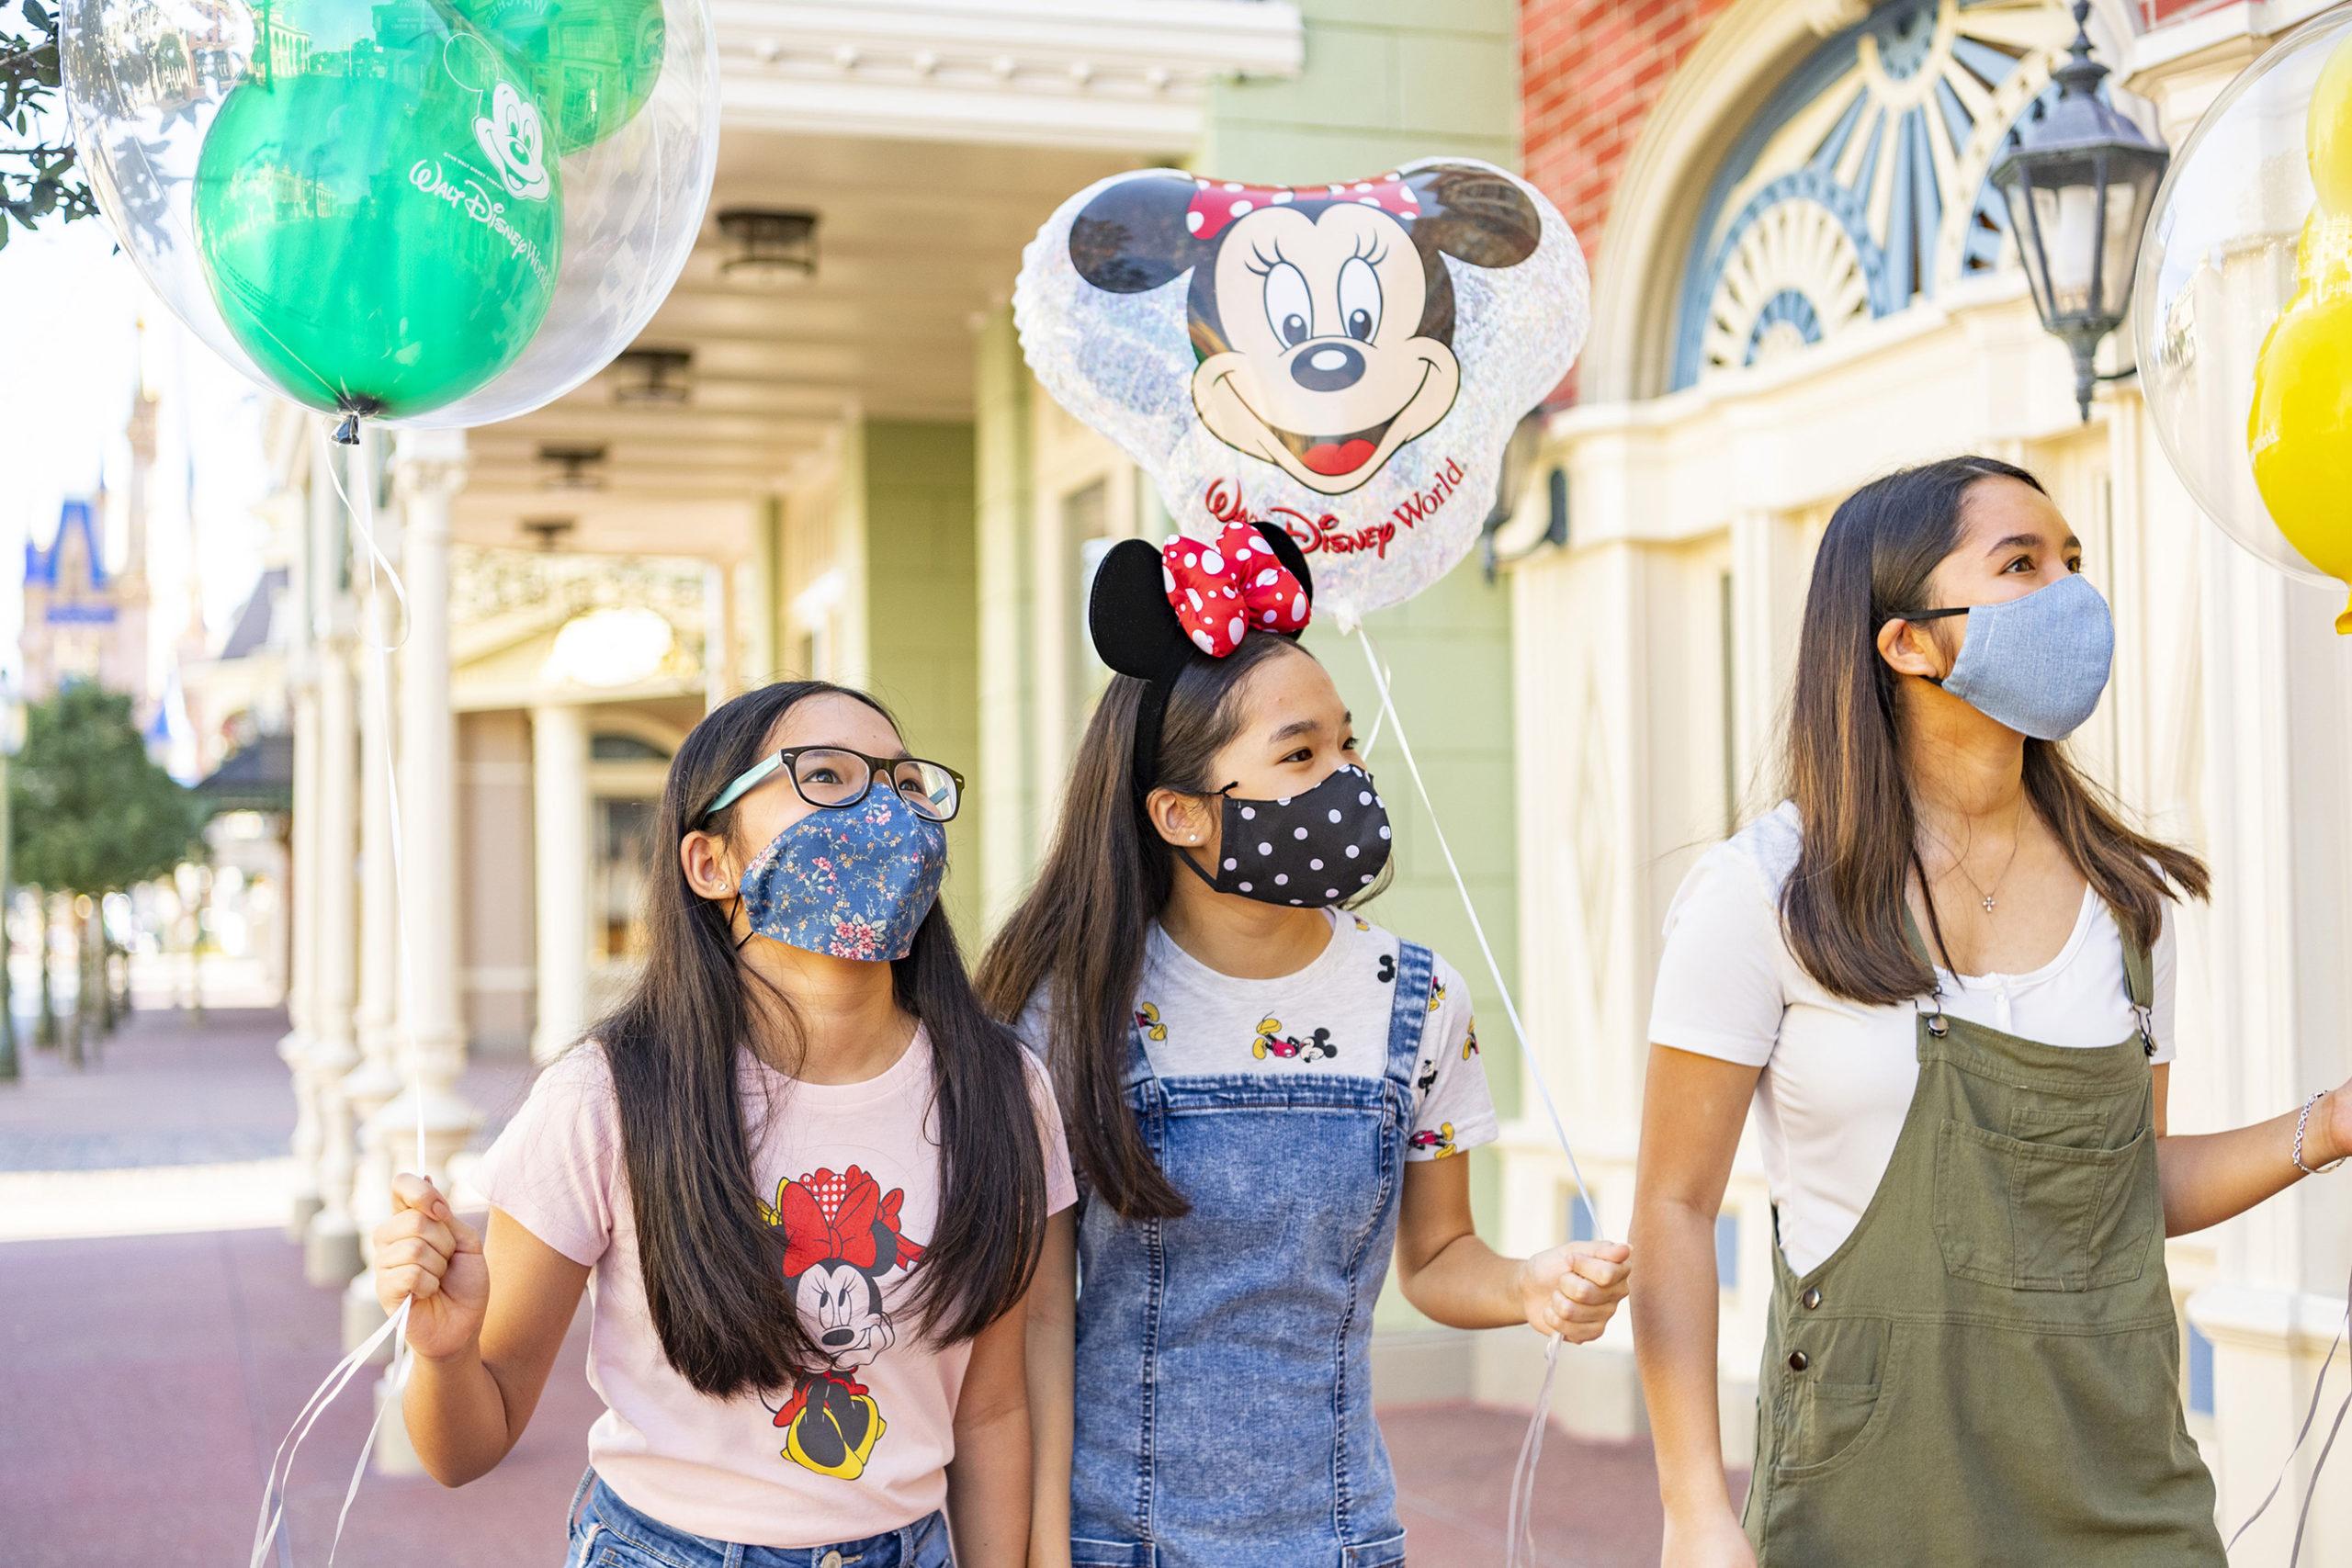 Disney Trip after a pandemic